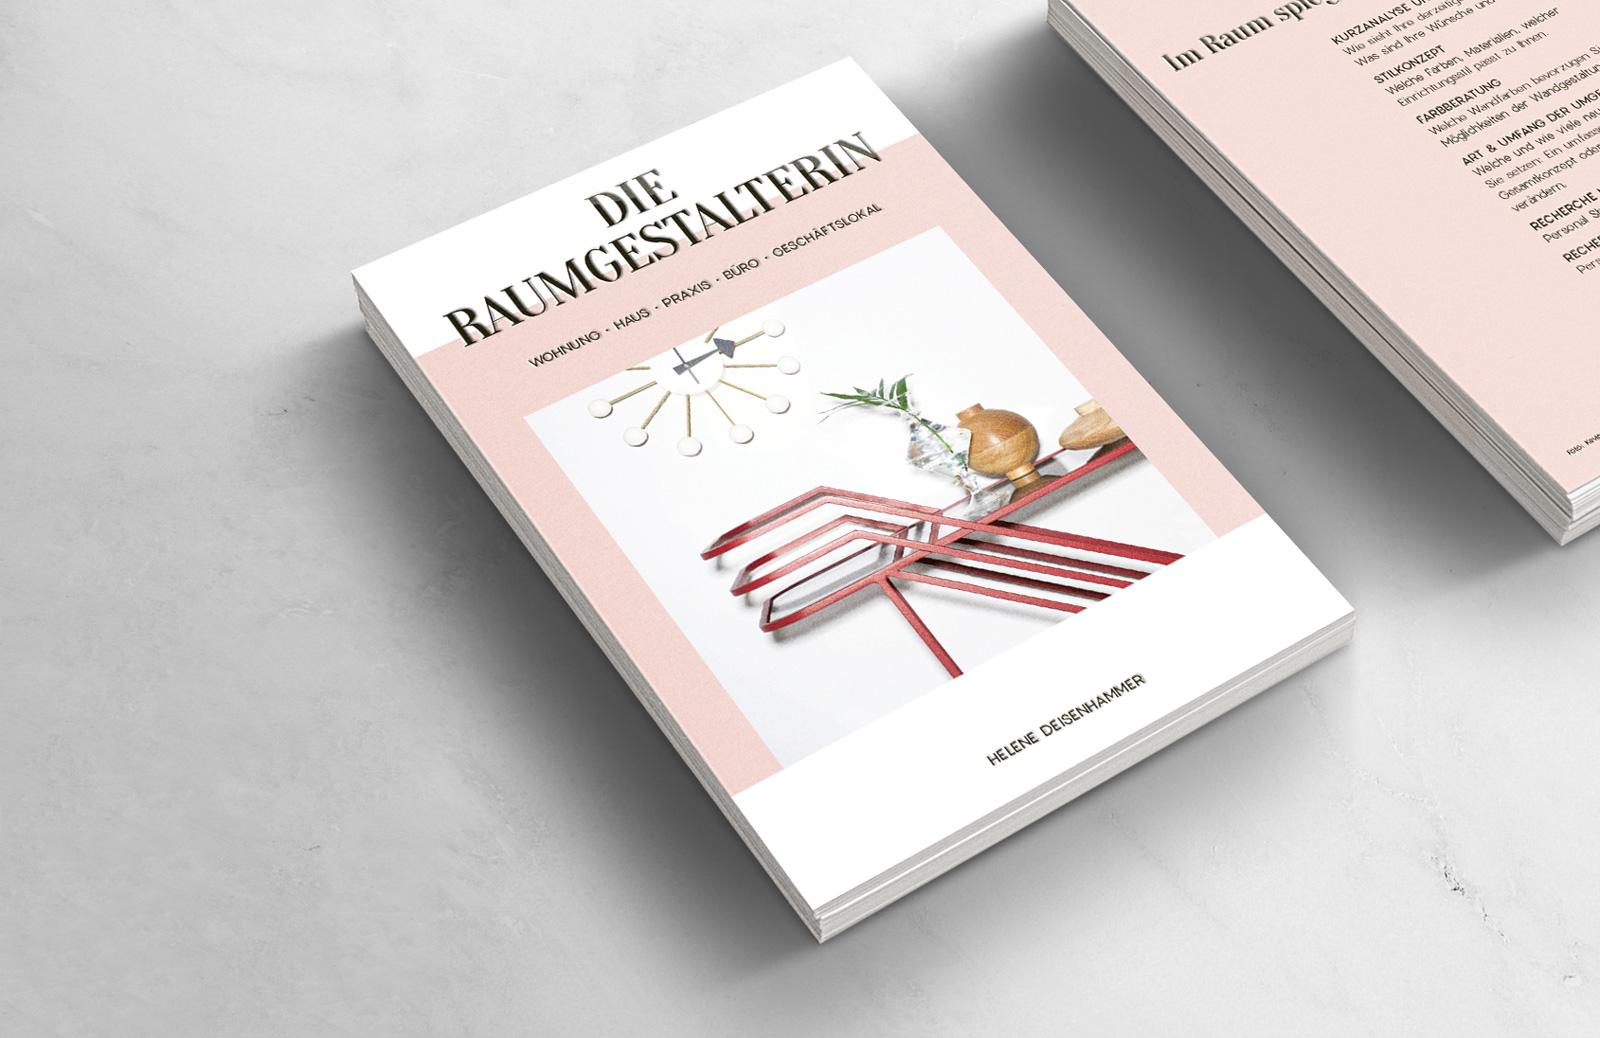 Die Raumgesalterin. Gesamtes Branding von Helene Deisenhammer Visual Storytelling for Brands